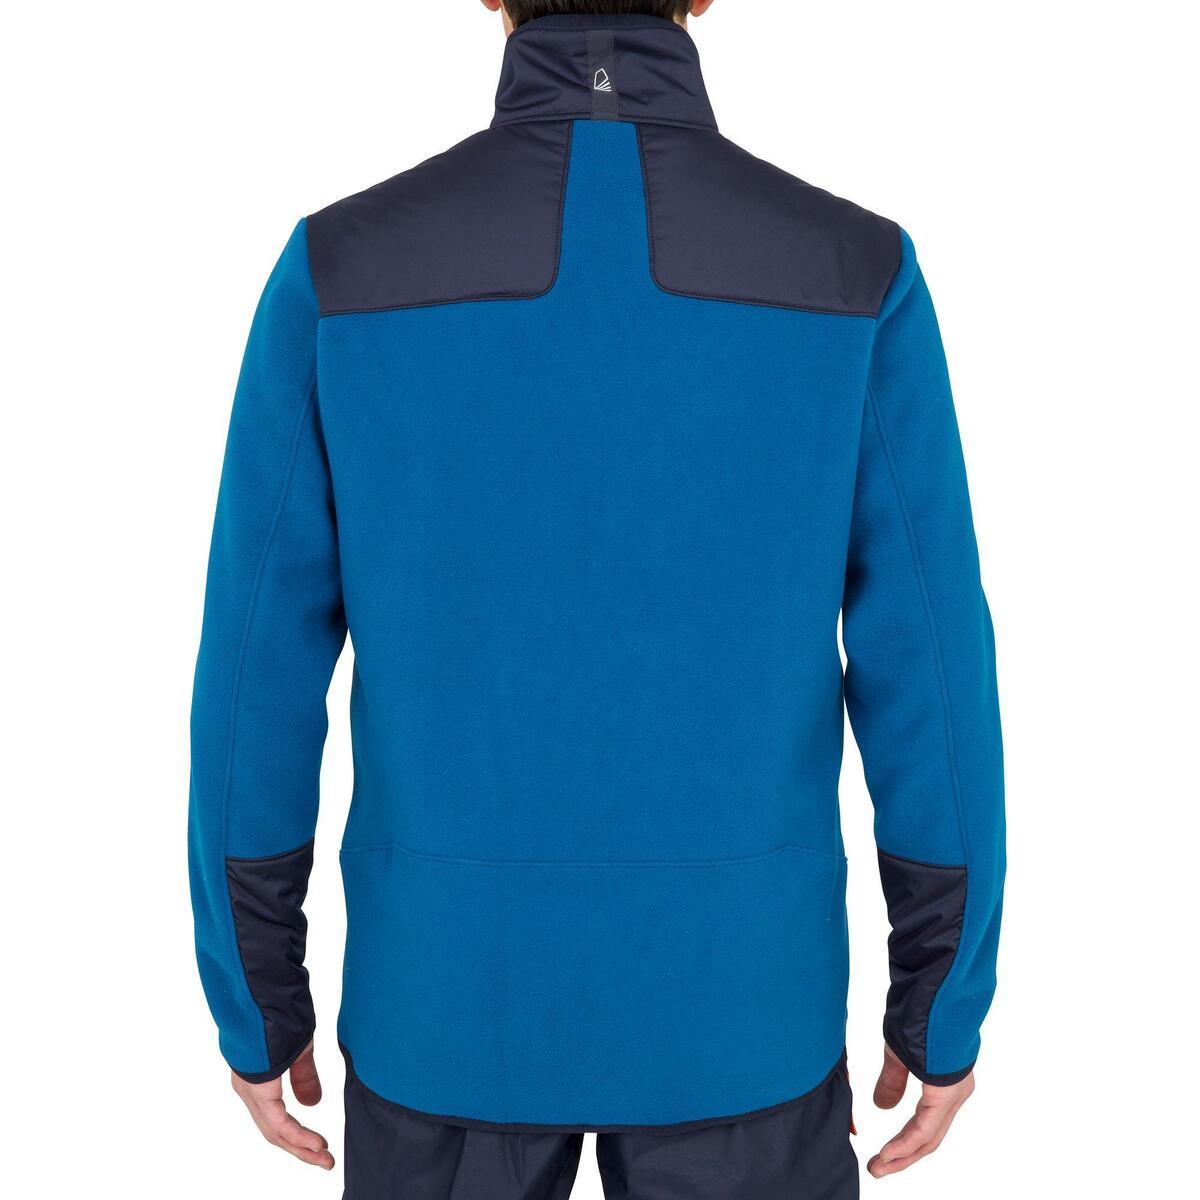 Bild 3 von Fleecejacke Segeln Sailing 500 warm Herren blau